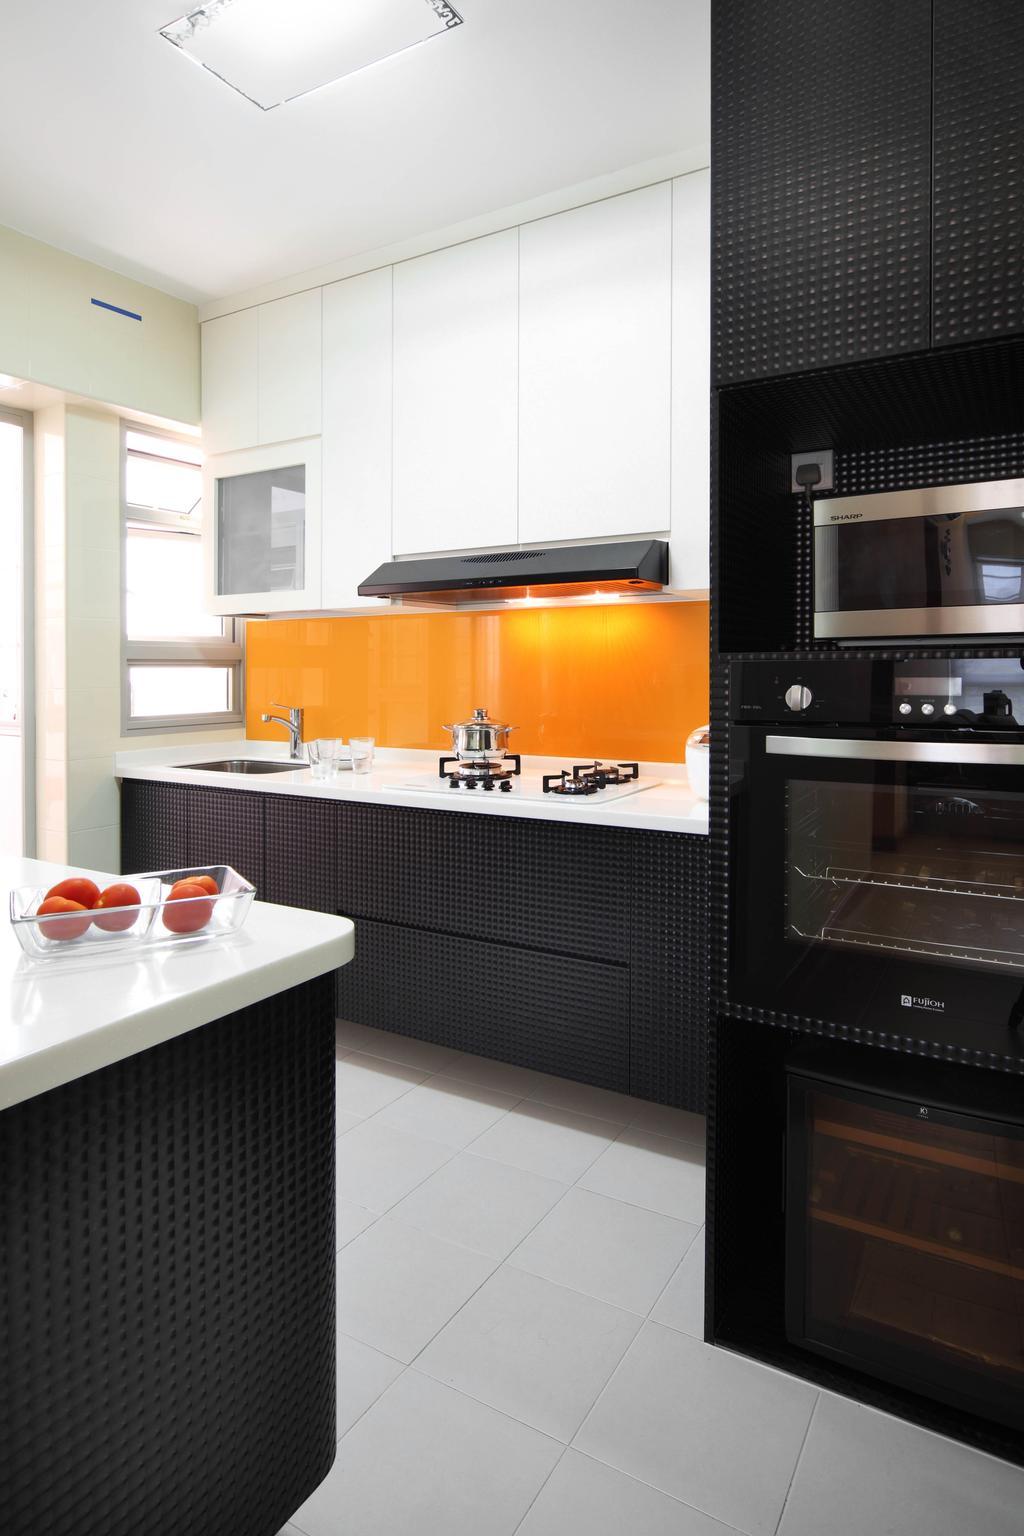 Eclectic, HDB, Kitchen, Punggol Place (Block 302C), Interior Designer, De Exclusive Design Group, Kitchen Cabinetry, Cabinets, Backplash, B W, Built In Oven, Kitchen Countertop, White Cabinets, Indoors, Interior Design, Room